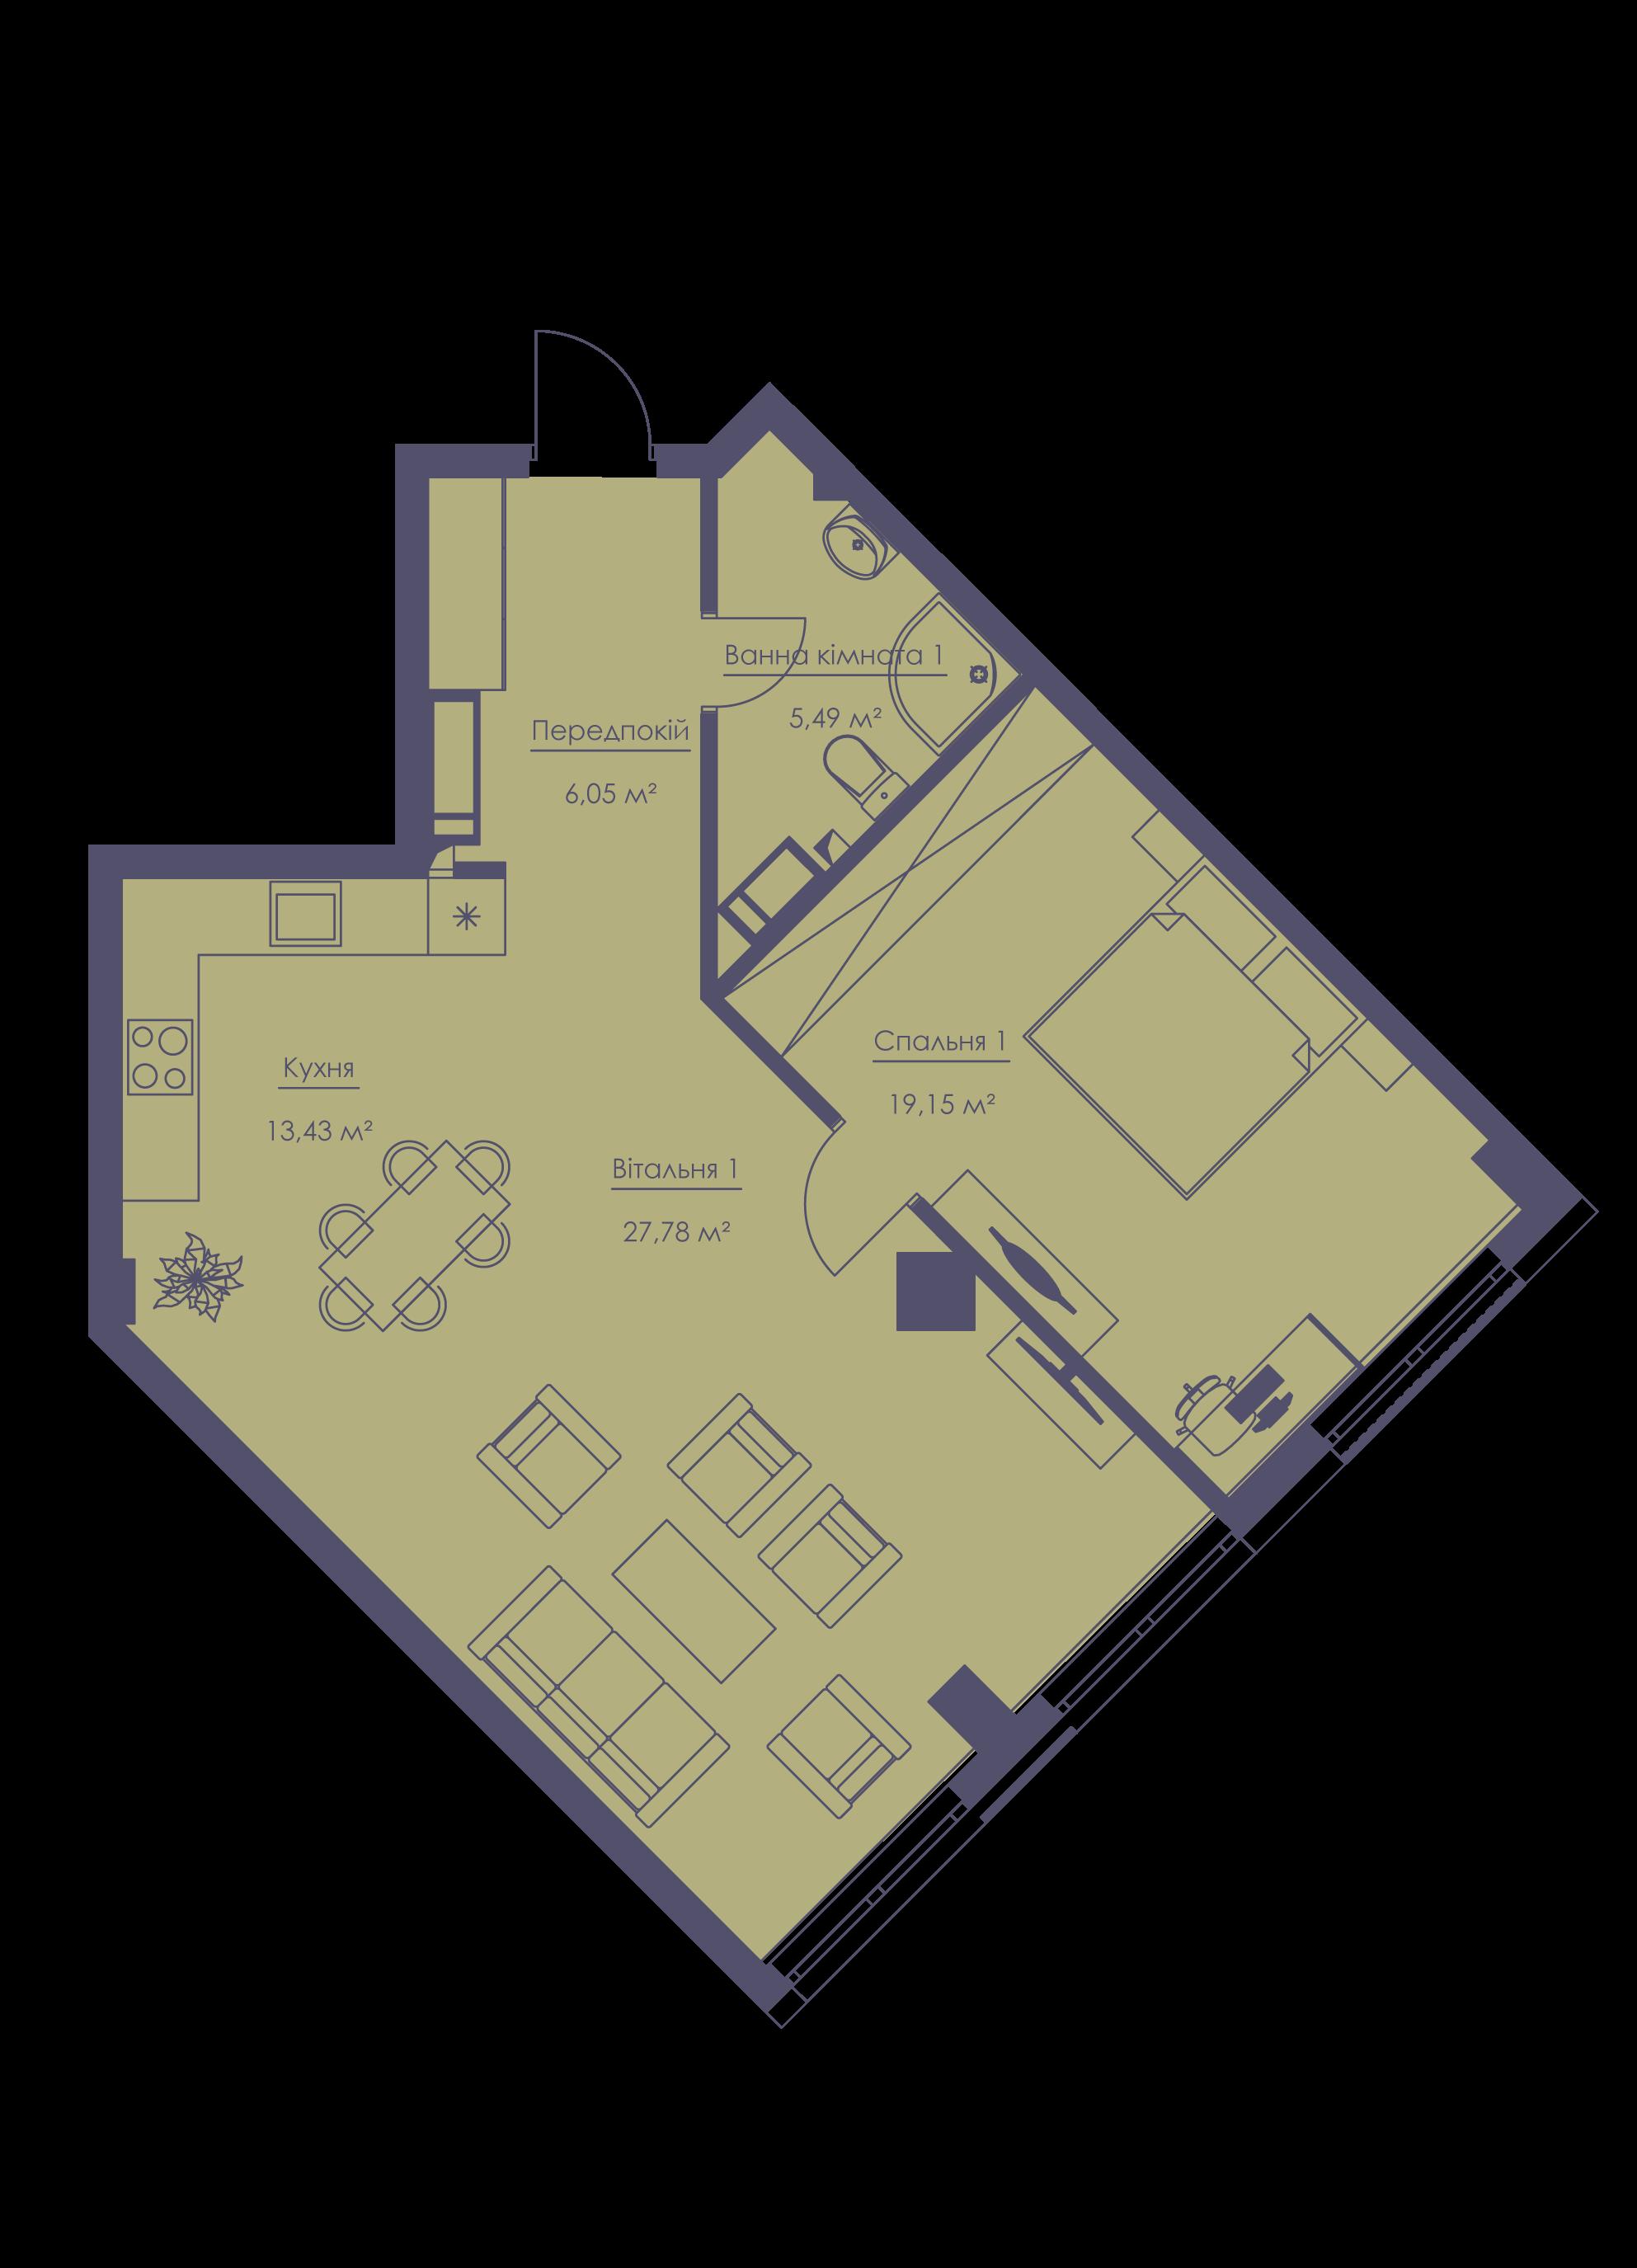 Apartment layout KV_43_2a_1_1_1-1